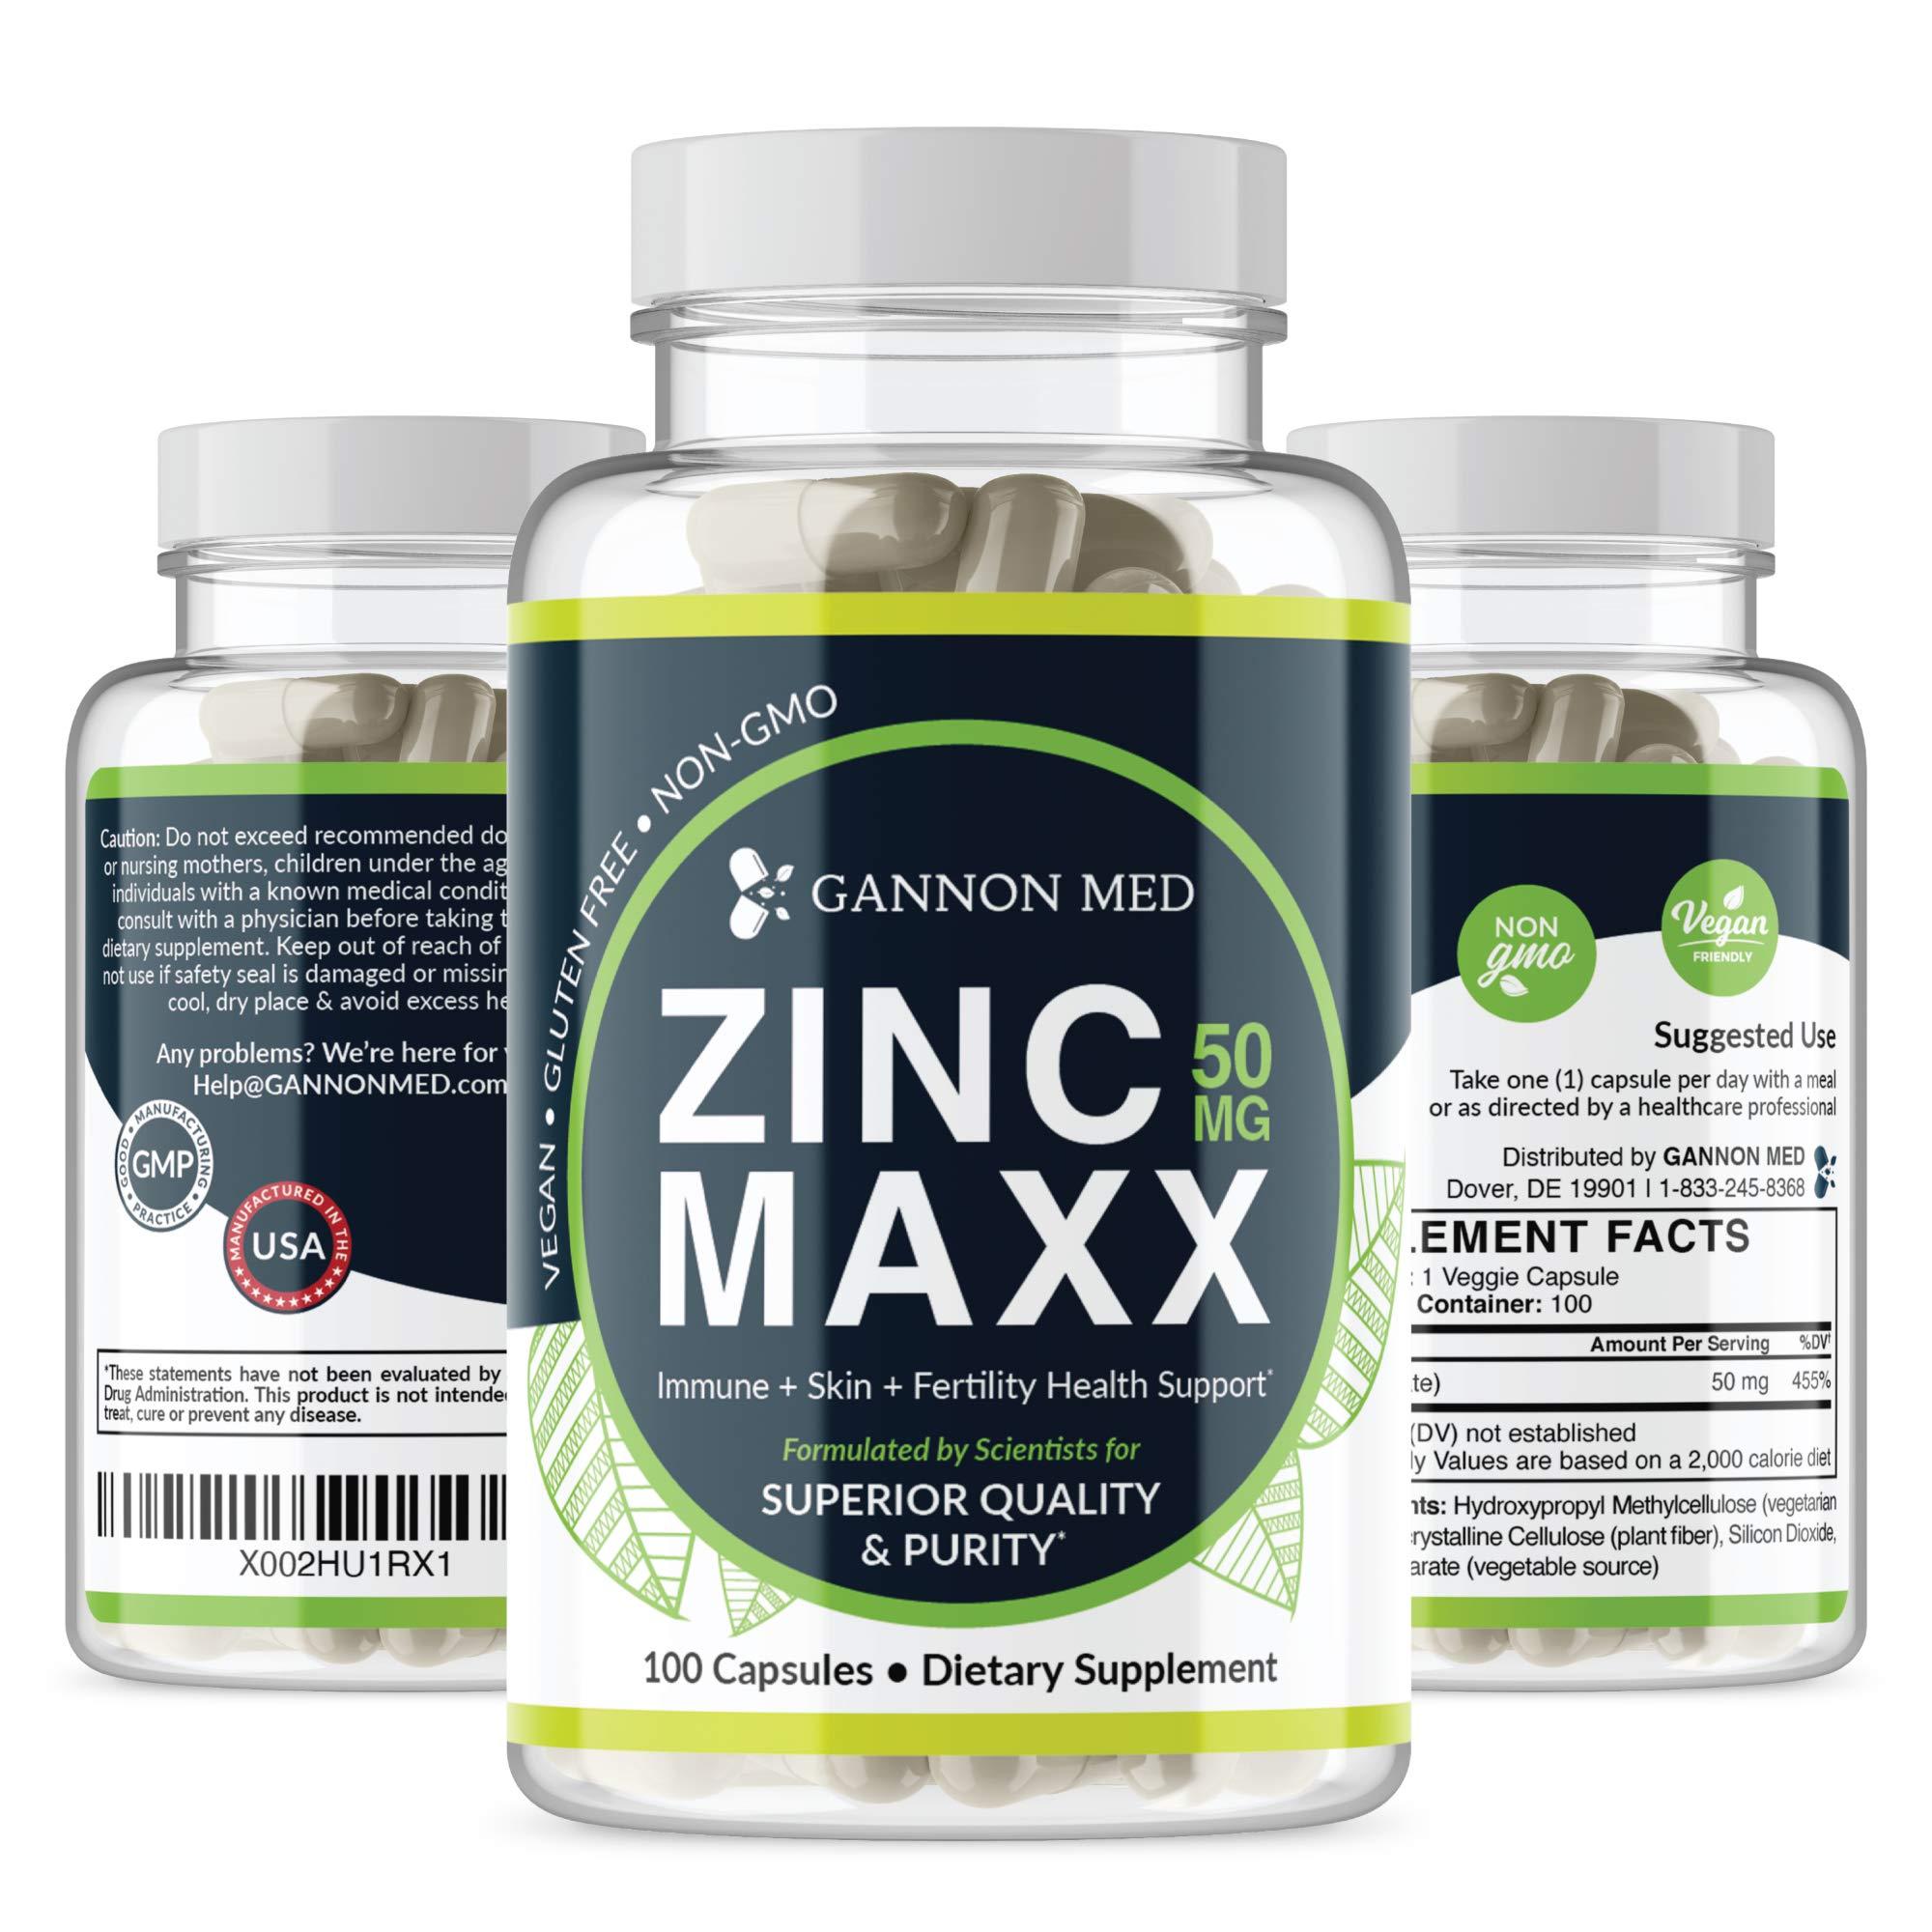 Zinc Maxx - Maximum Zinc Gluconate 50 mg per dose - 100 Day Supply - High Potency & Absorbance - Gentle On Stomach - Professional Grade - Antioxidant - Vegan - Additive Free - Non-GMO - USA (1 Pack)